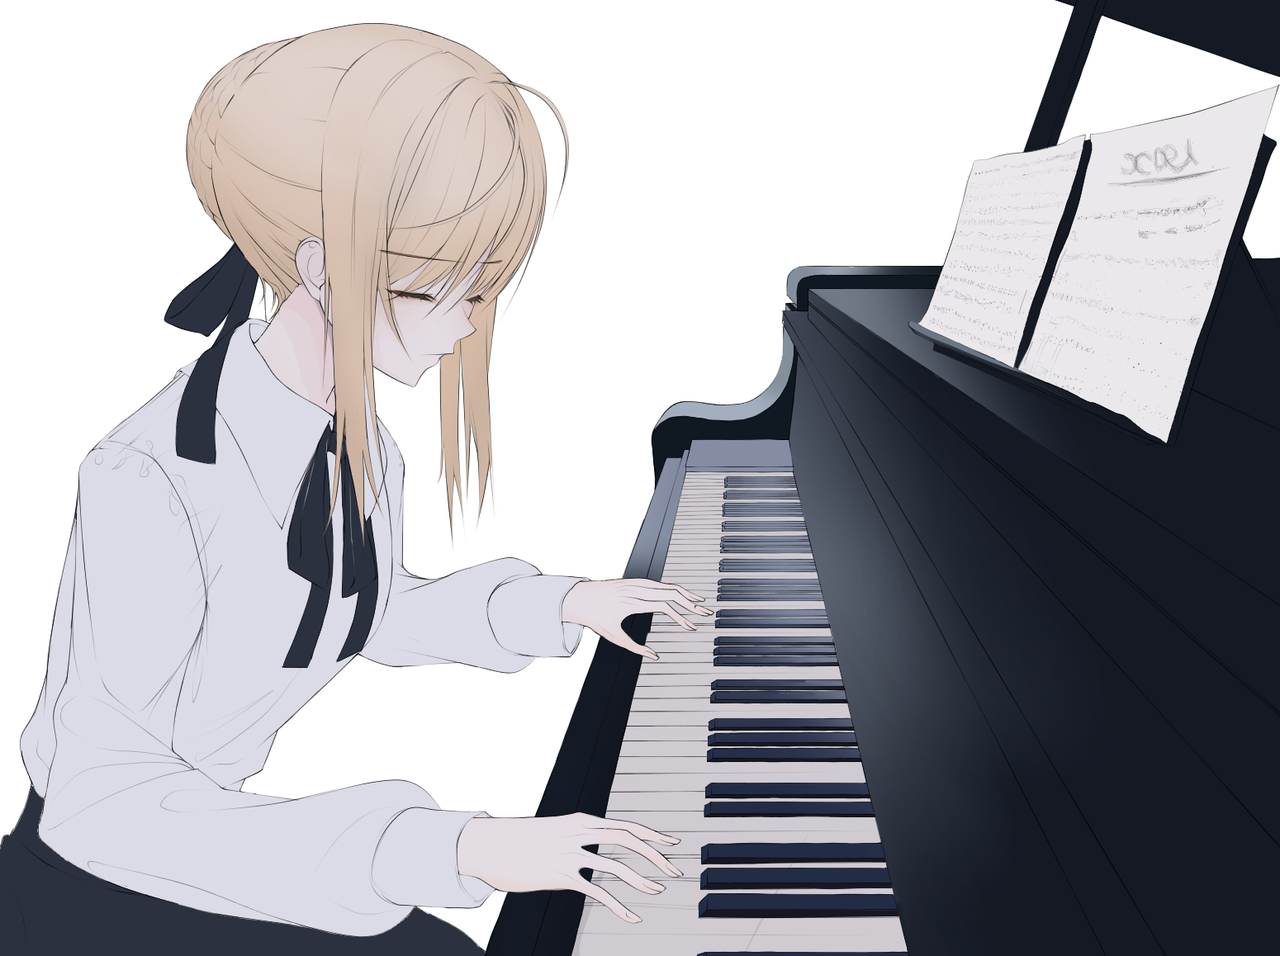 Ⅲ Illust of SOUZE medibangpaint Fate girl 便服 saber 蹲姿 piano